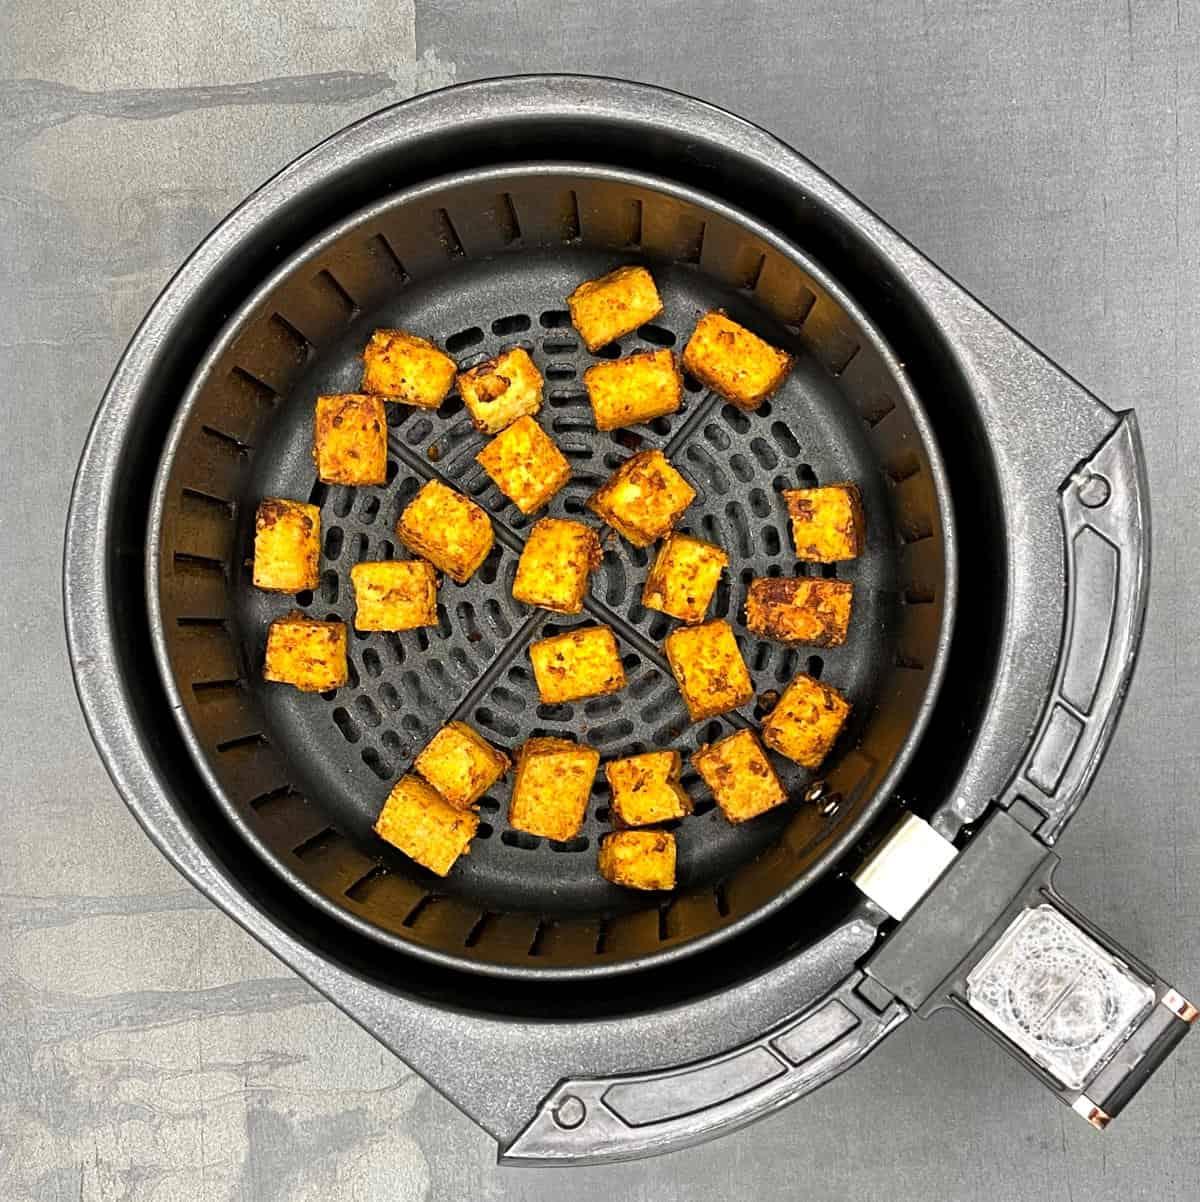 Air fryer tofu step-by-step process photos